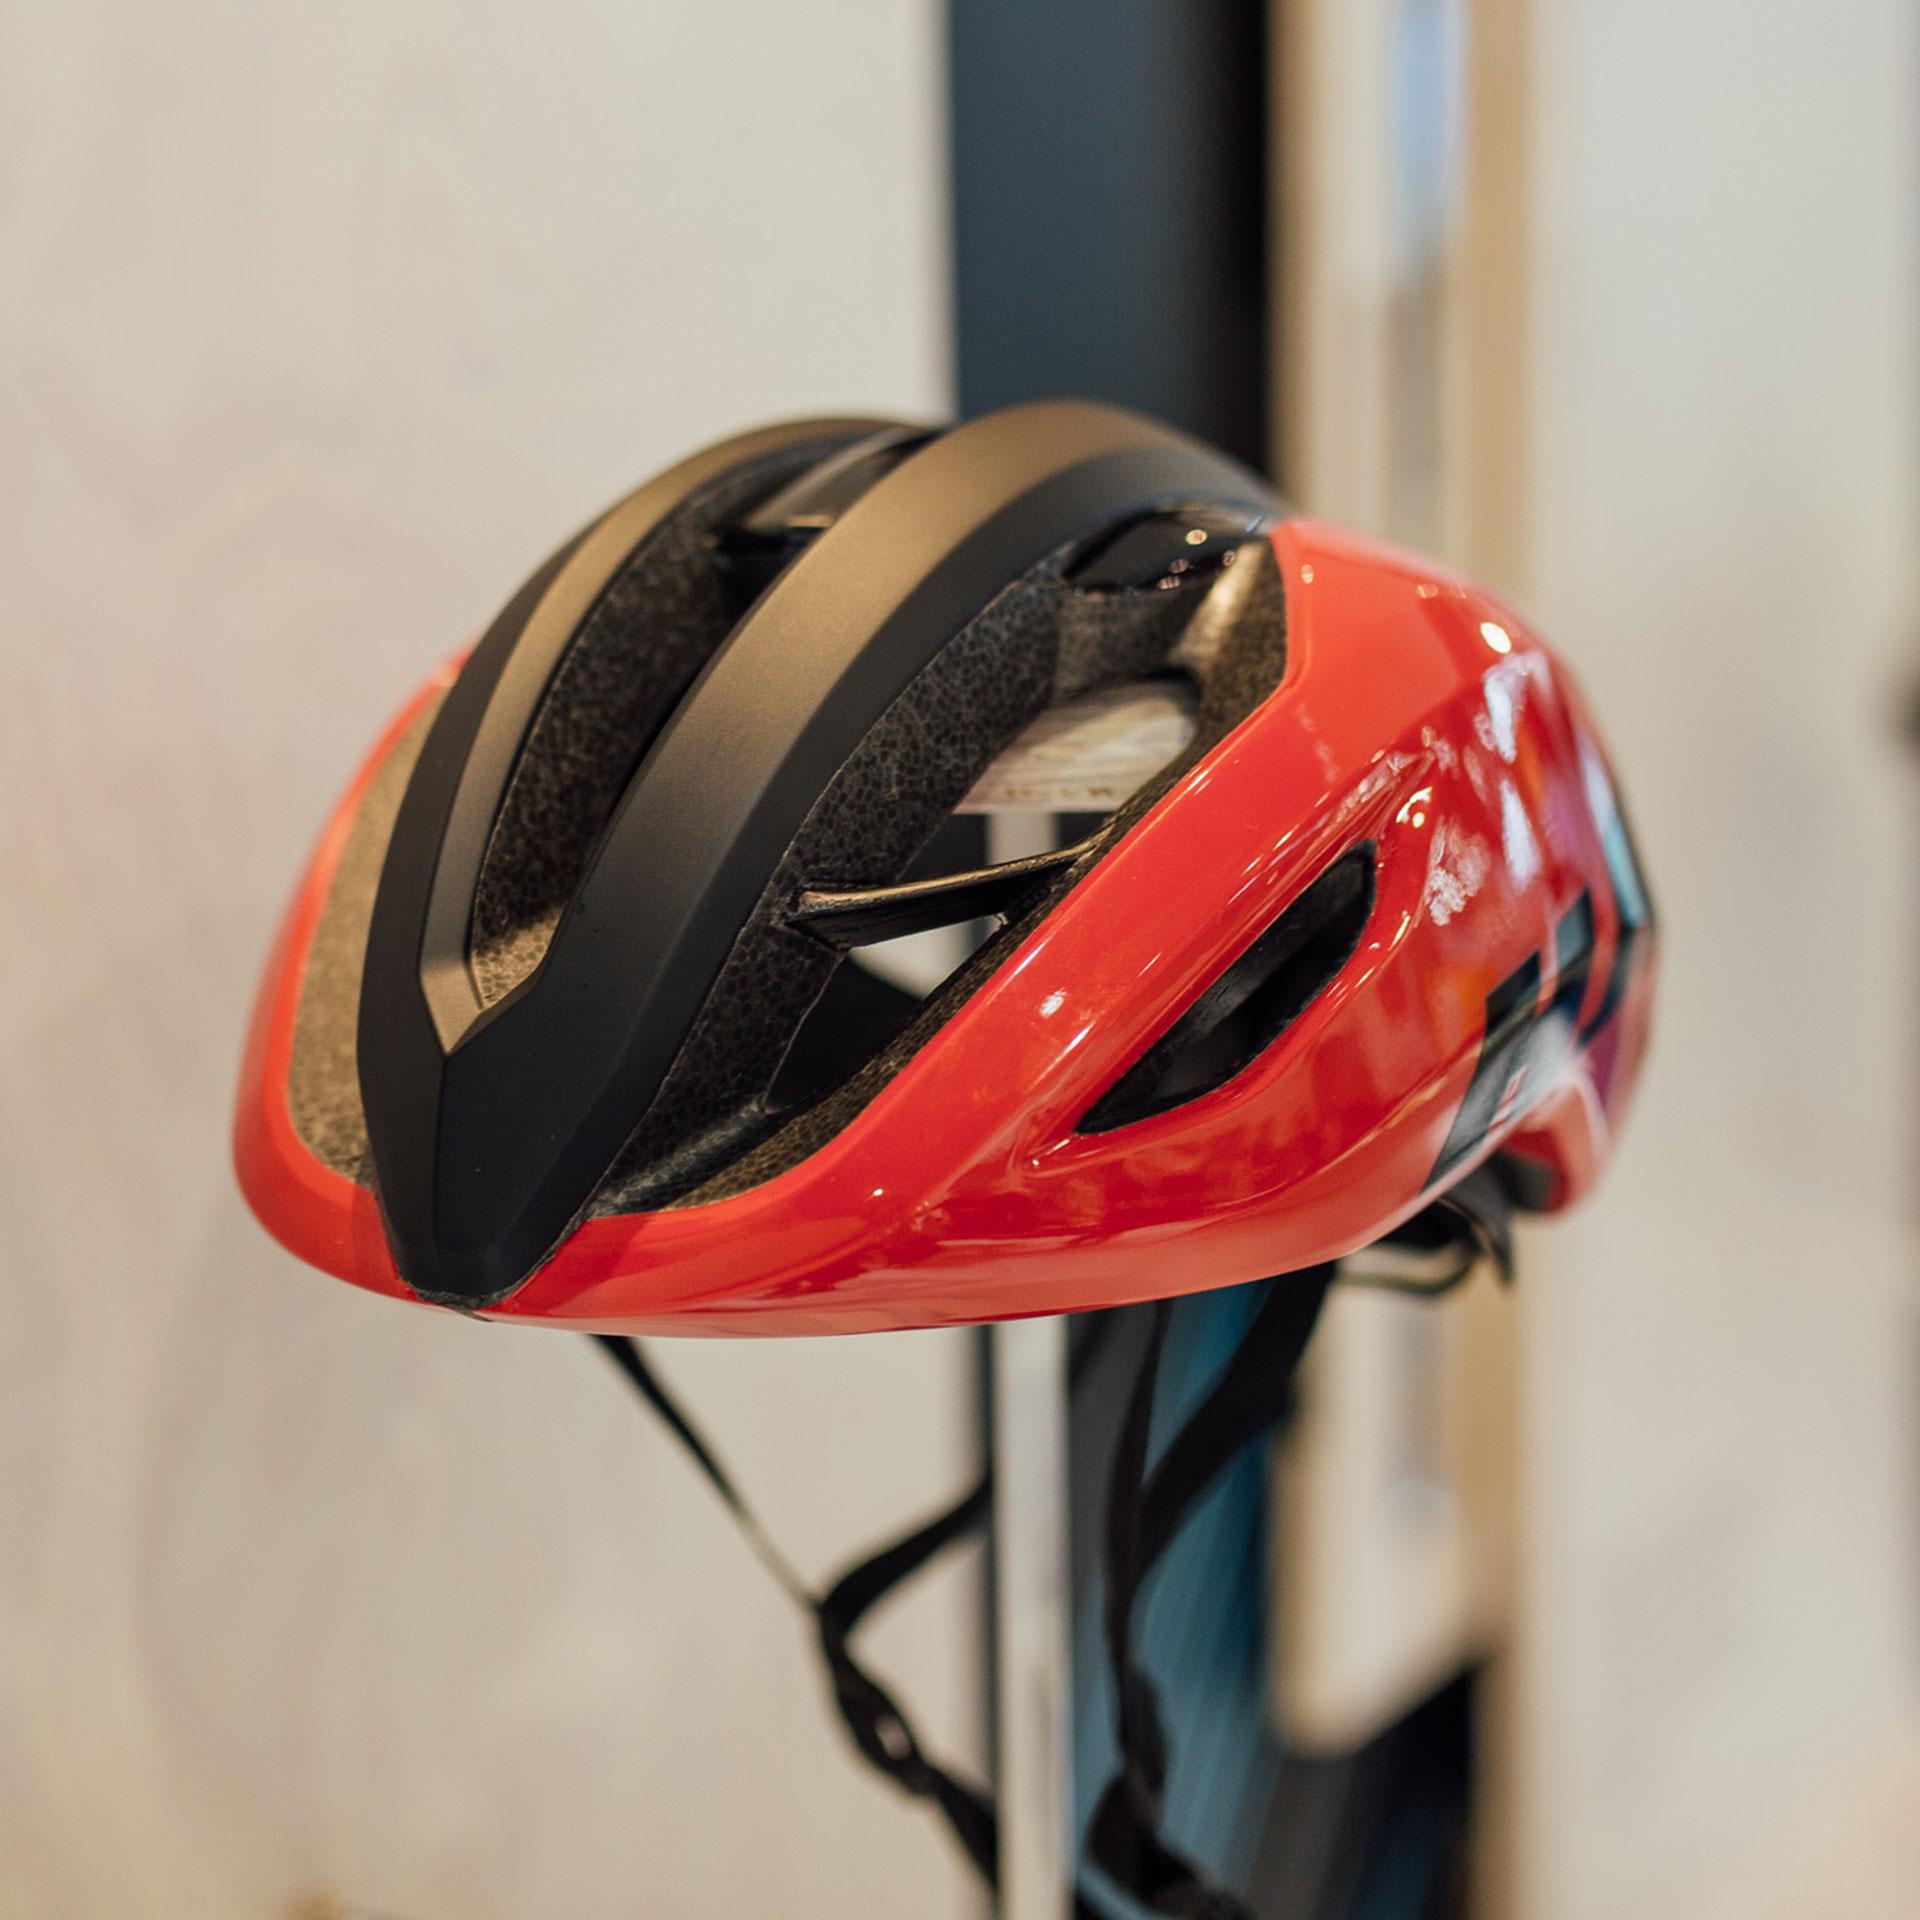 HJC Valeco Road Helmet